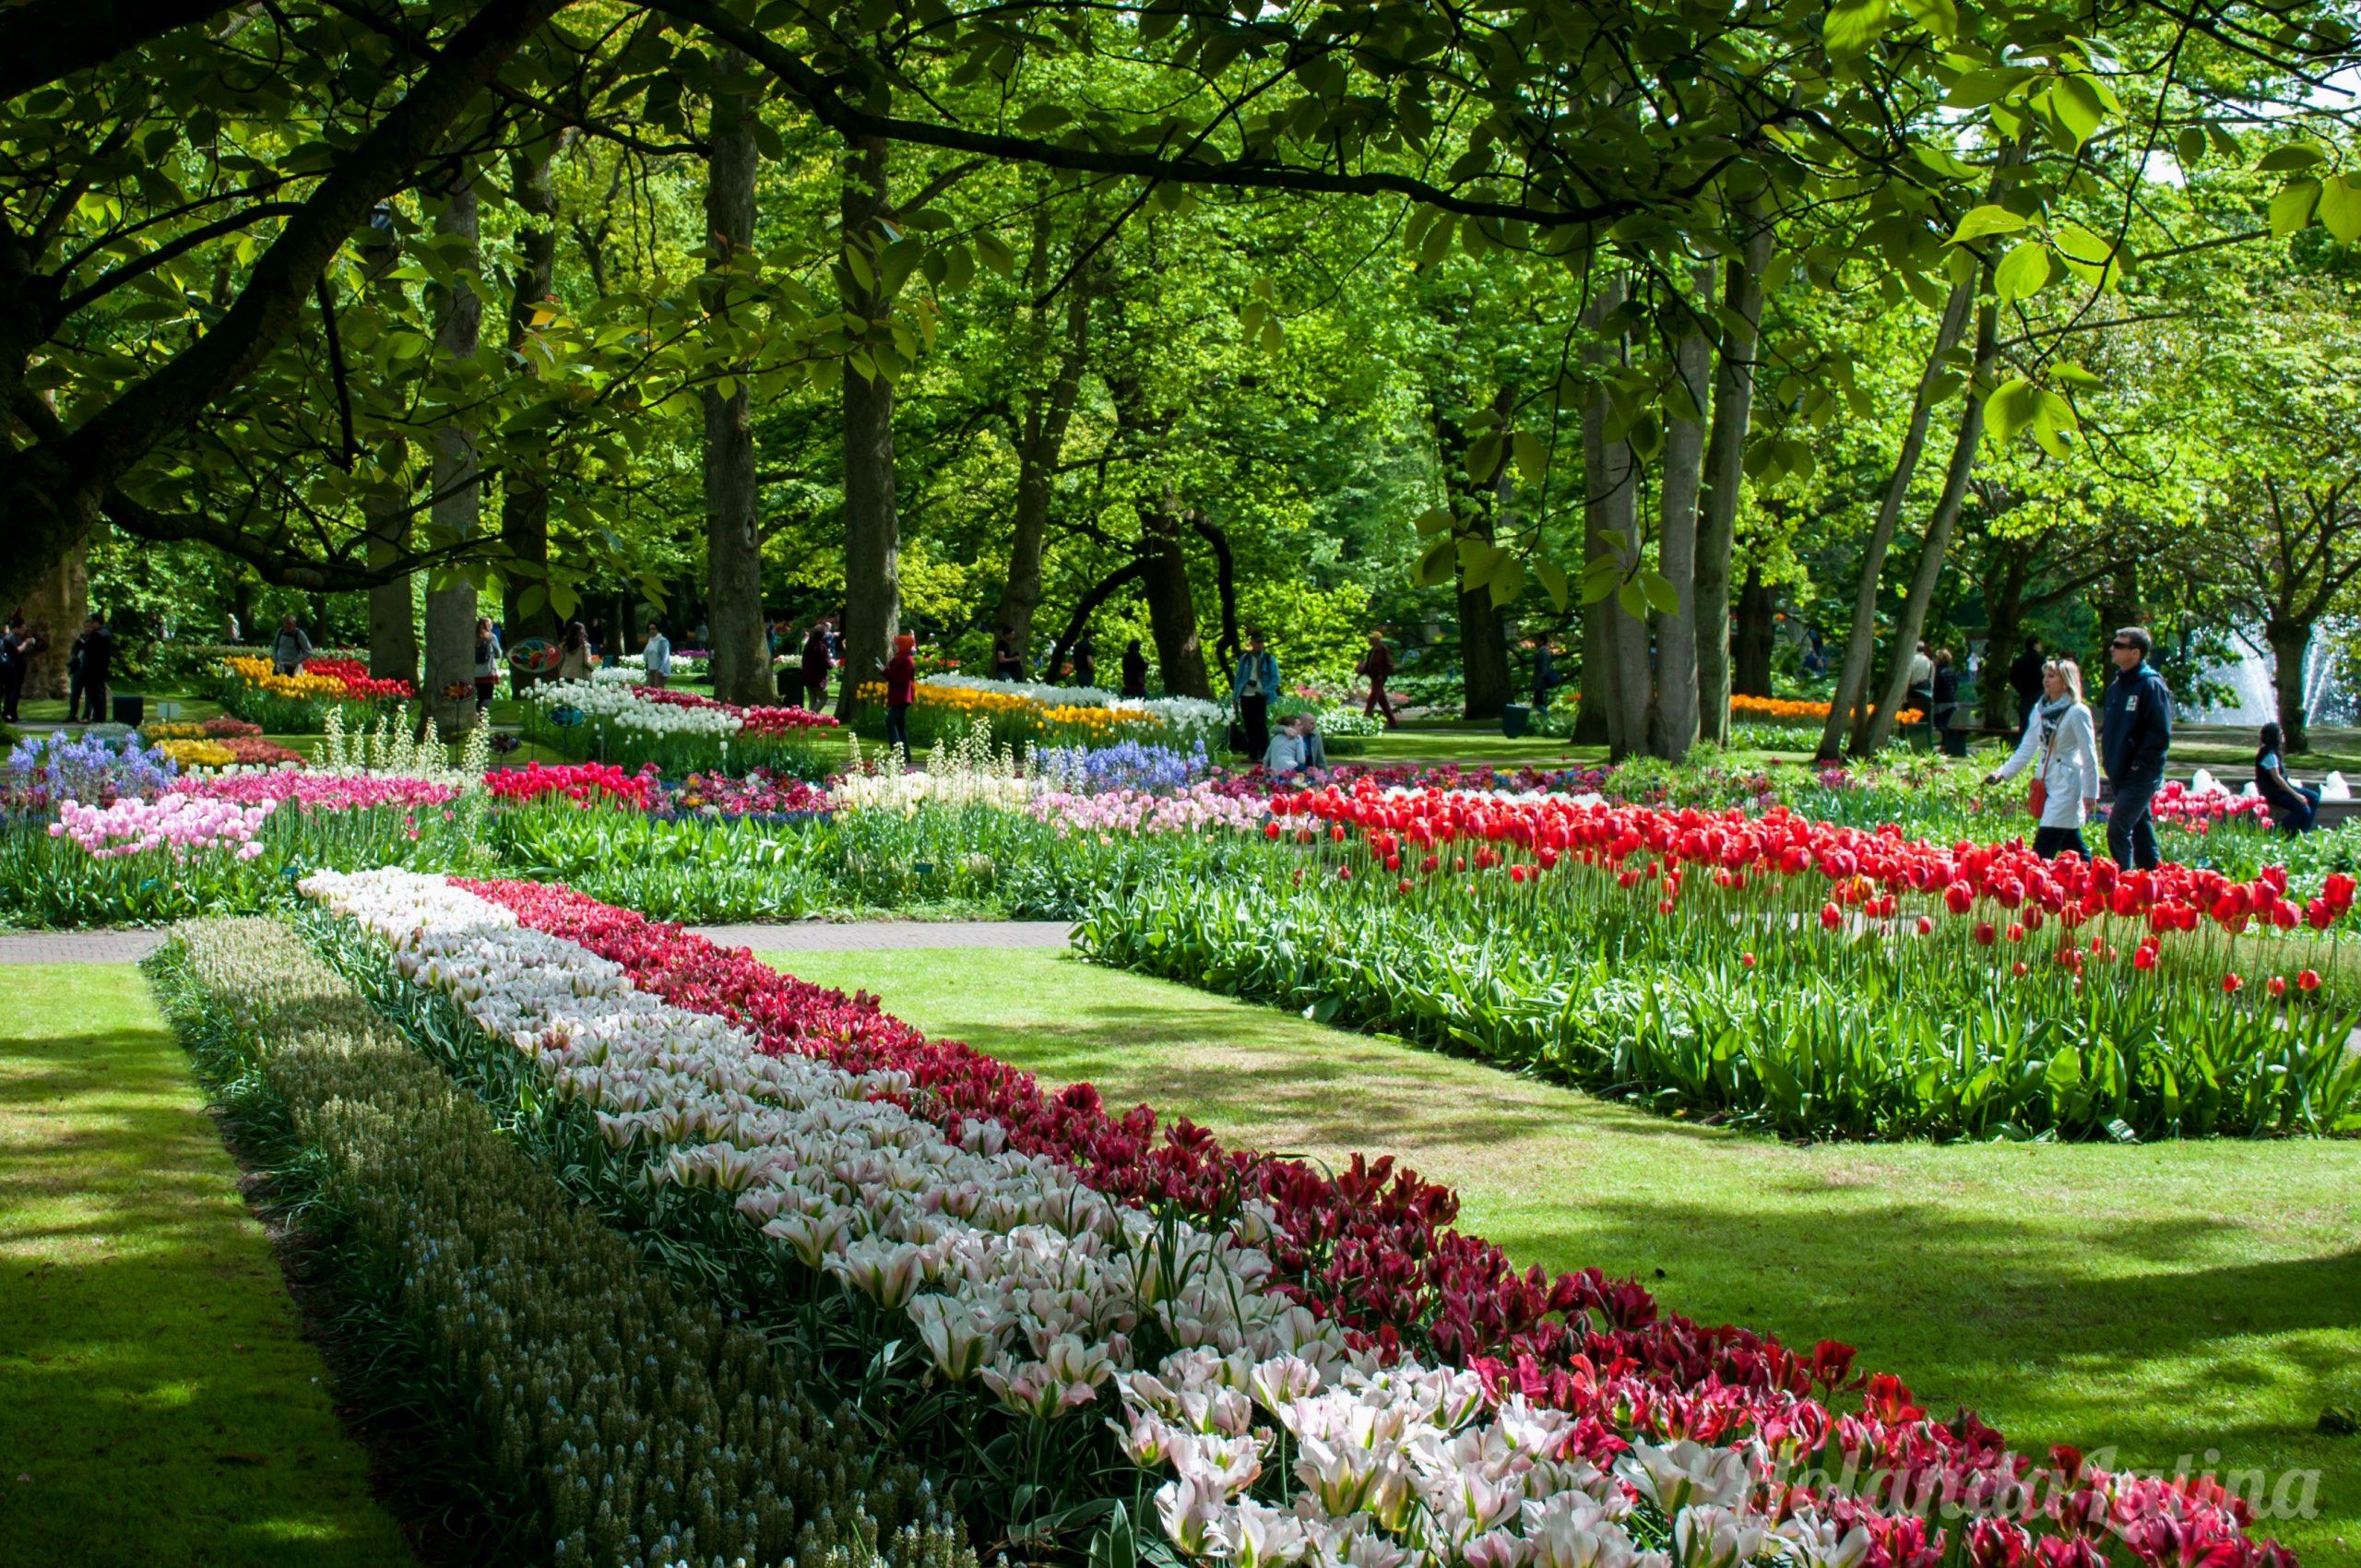 Rare Jardines De Keukenhof Amsterdam tout Jardin De Keukenhof